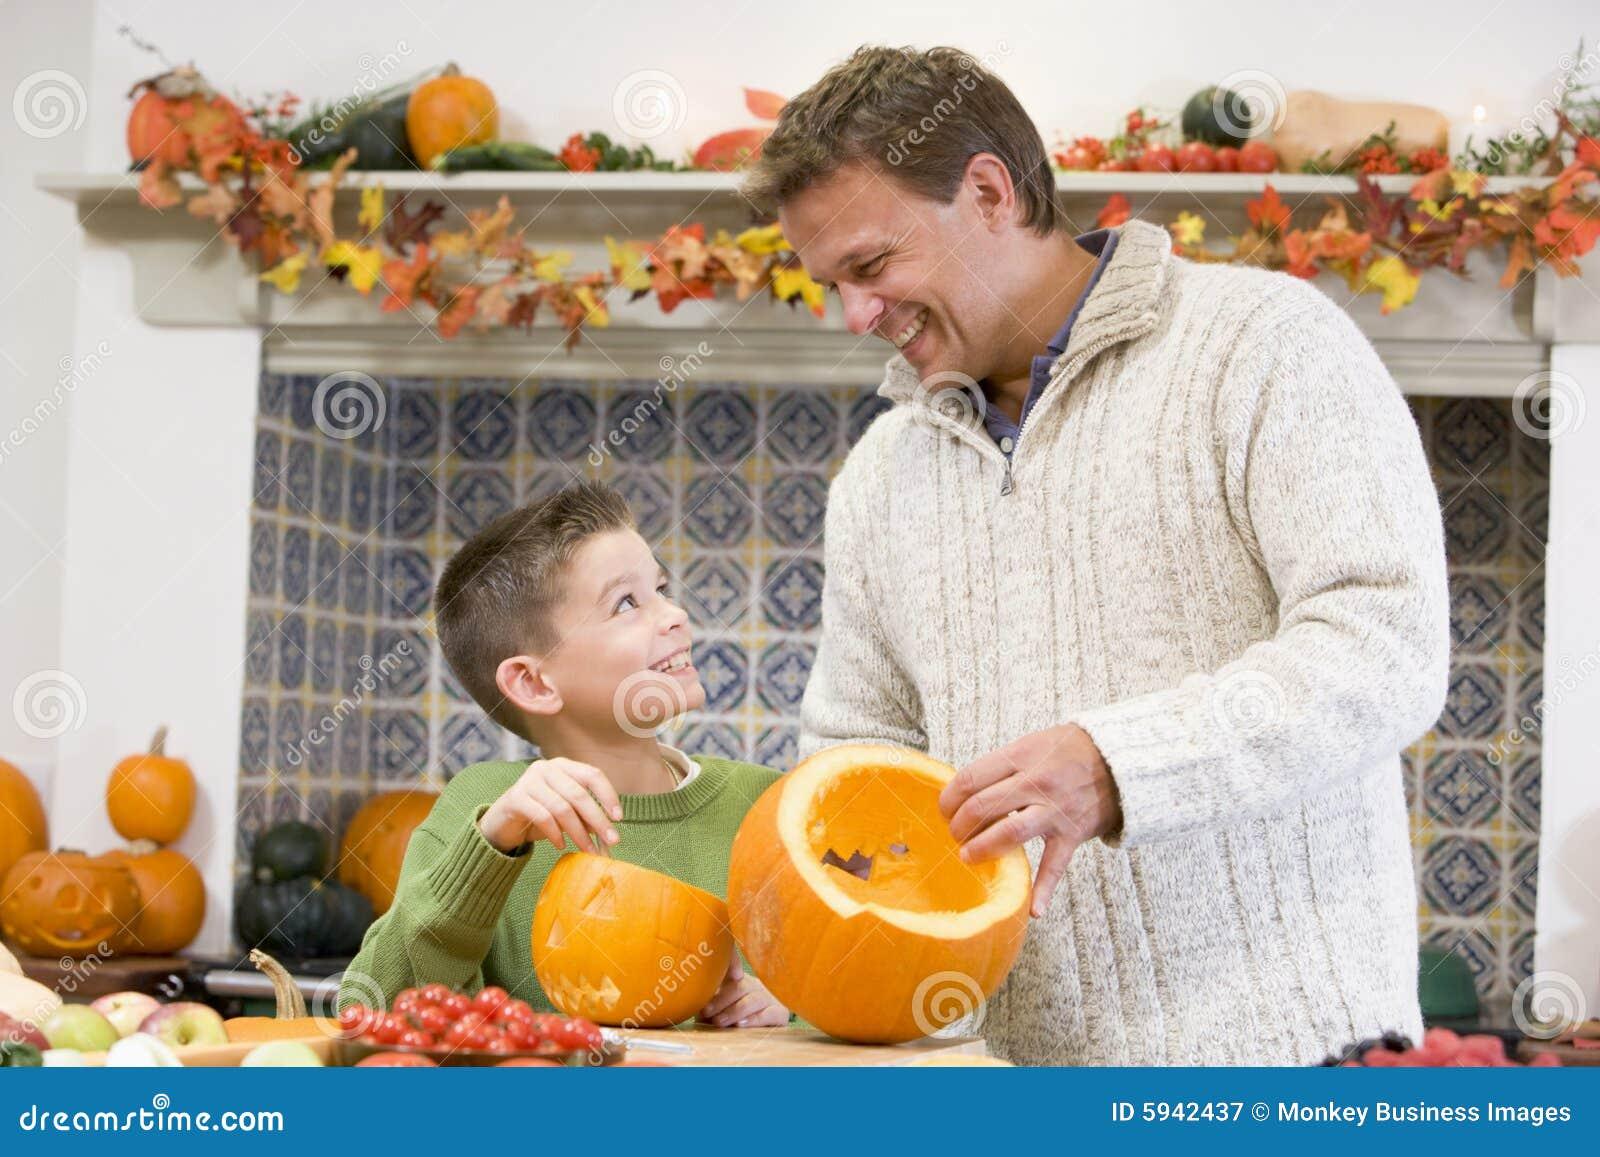 Carving father halloween punpkin son